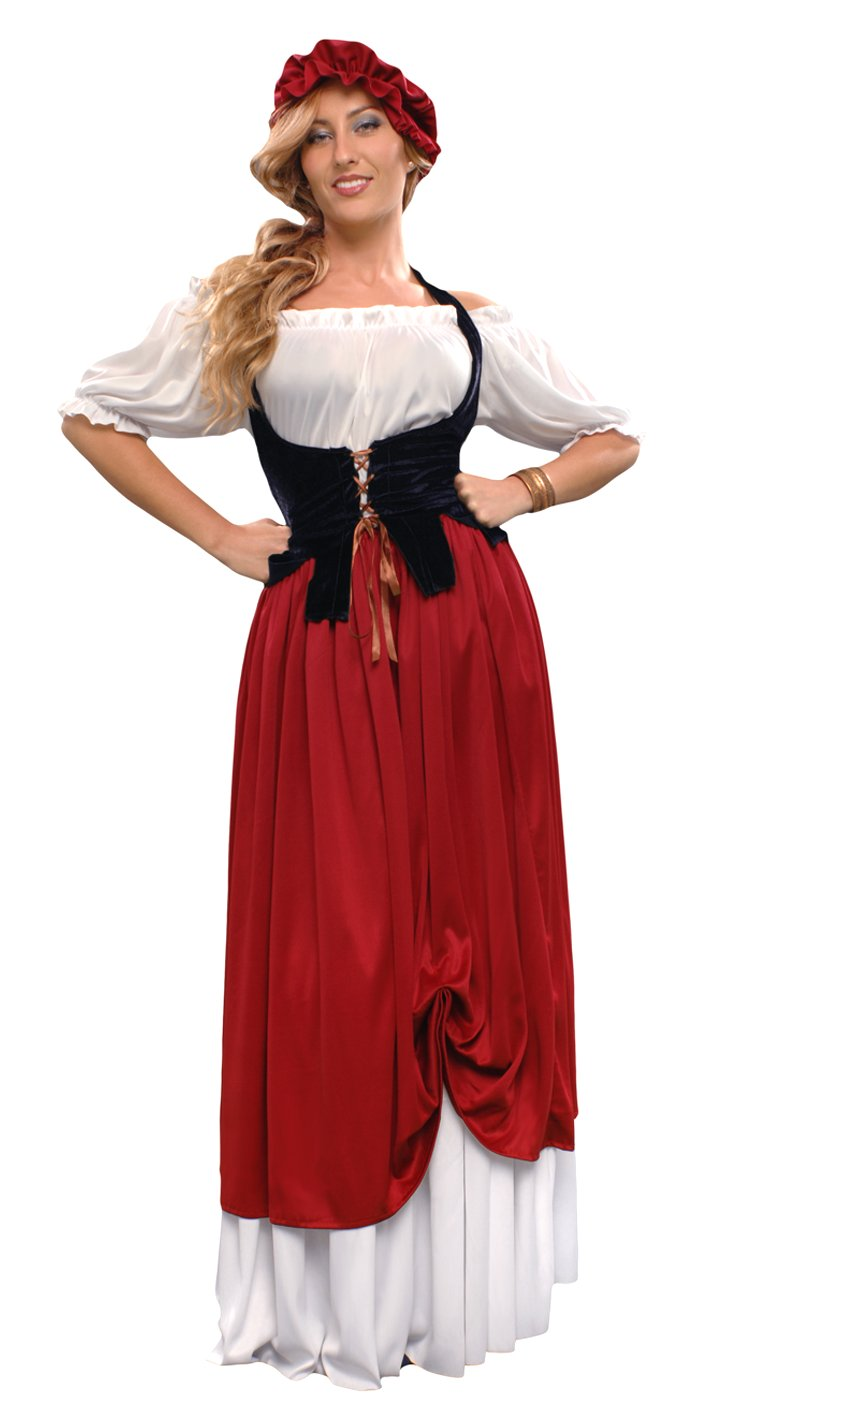 Costume-Médiévale-F41-choix-2